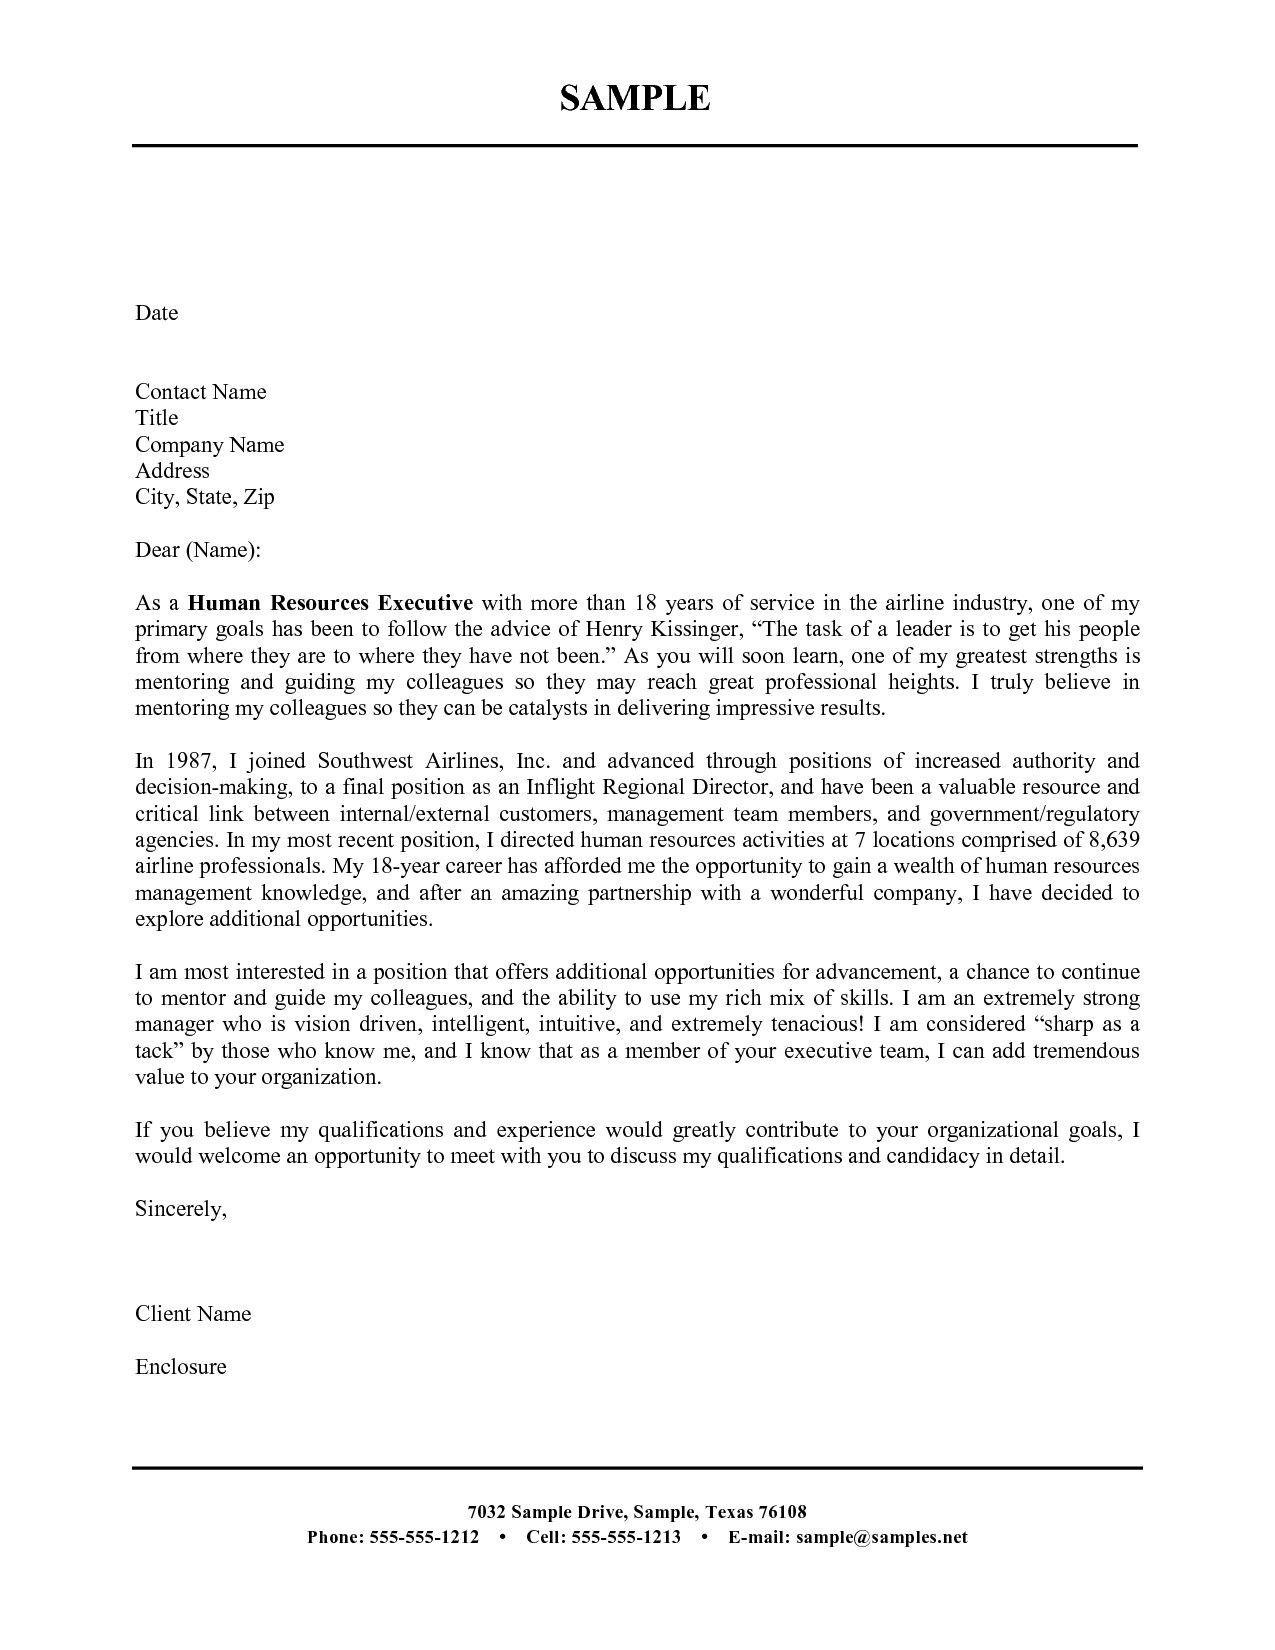 003 Unique Microsoft Word Letter Template Design  Free Download M Of ResignationFull